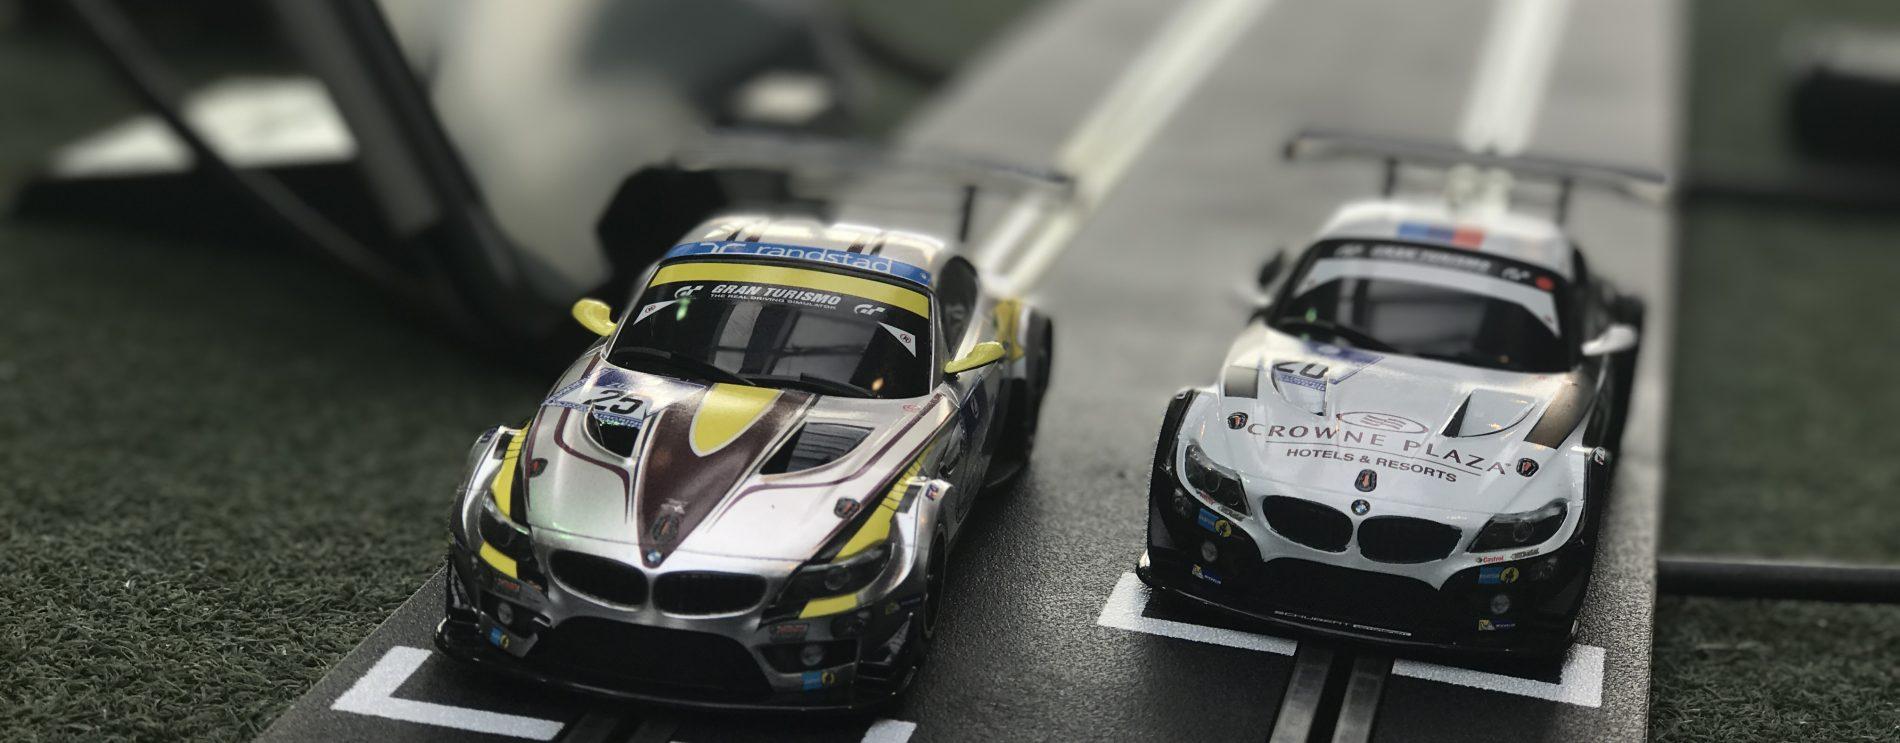 Slotcarbahn Motorsport Events